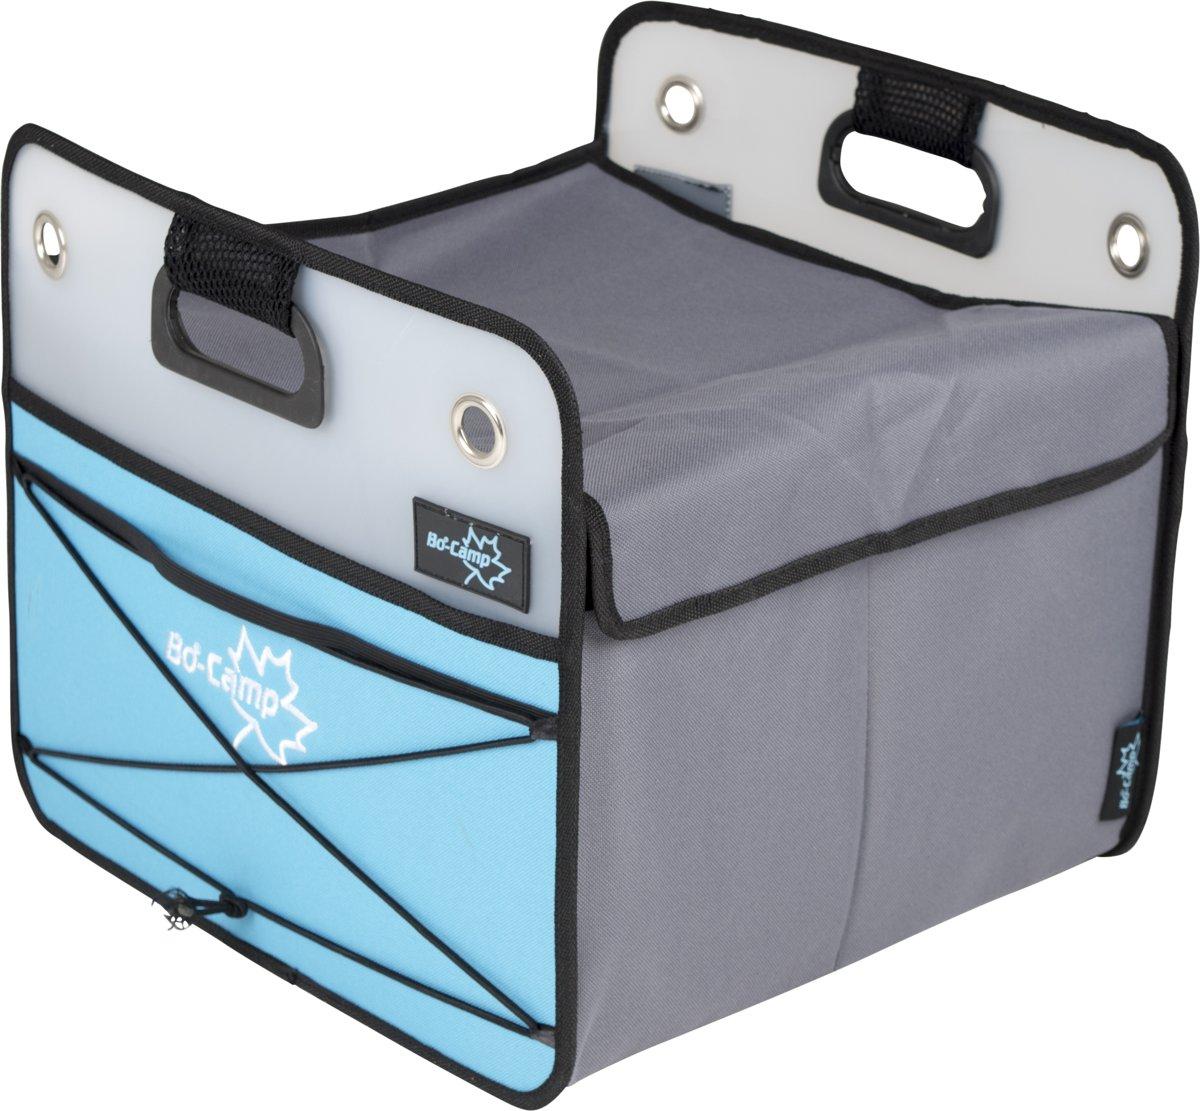 Bo-Camp Opbergbox - Smart Medium - Opvouwbaar - 33x36x31 Cm kopen